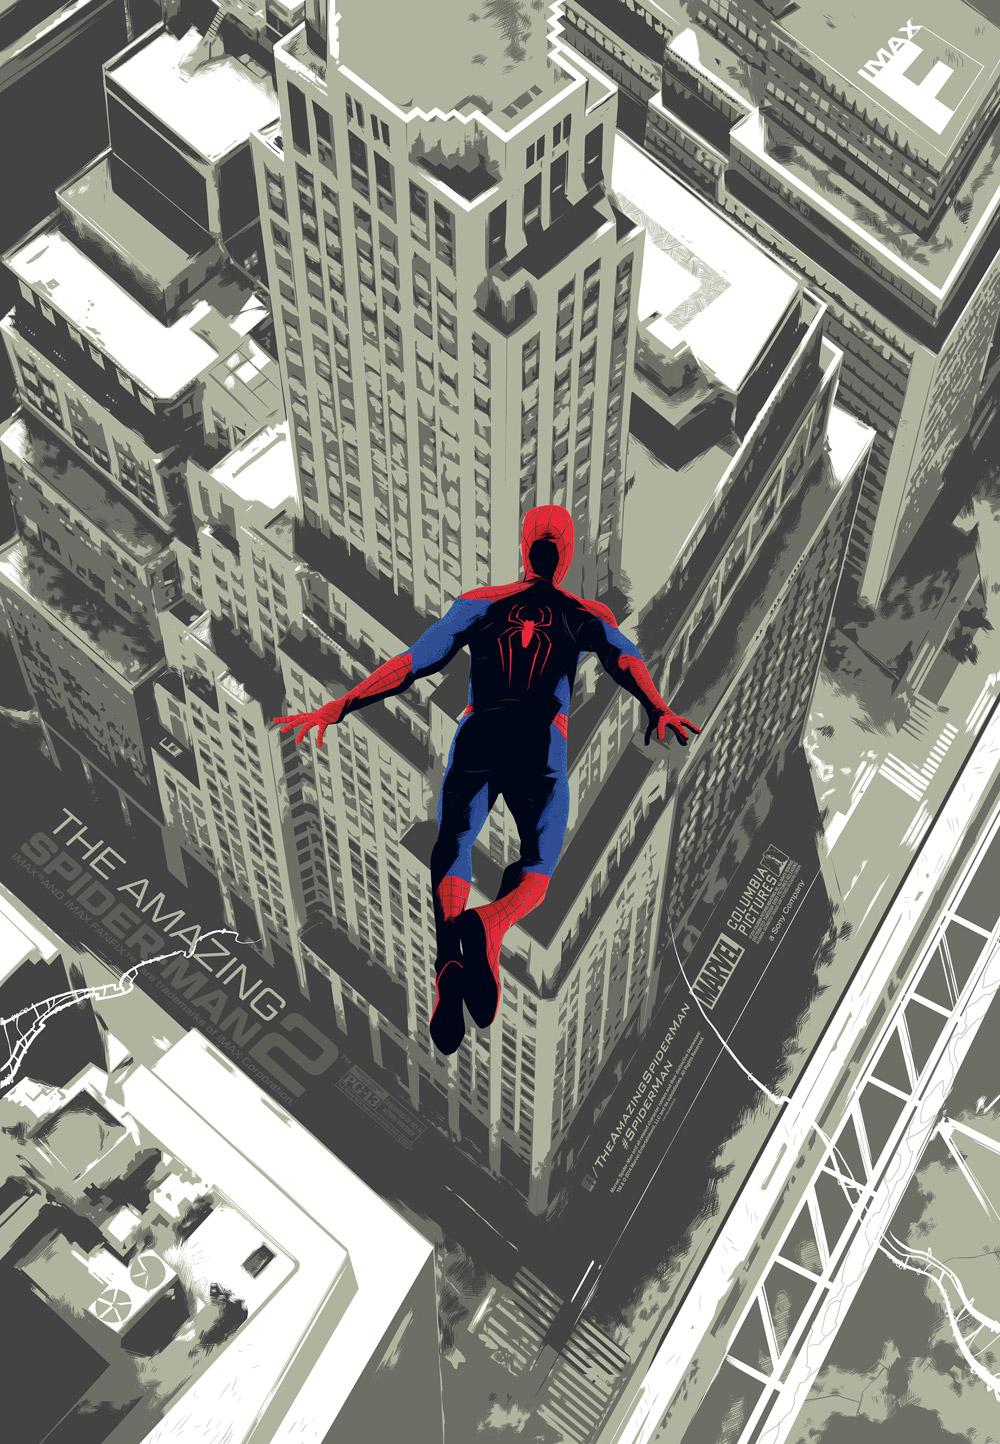 The-Amazing-Spider-man-2-by-Matt-Taylor